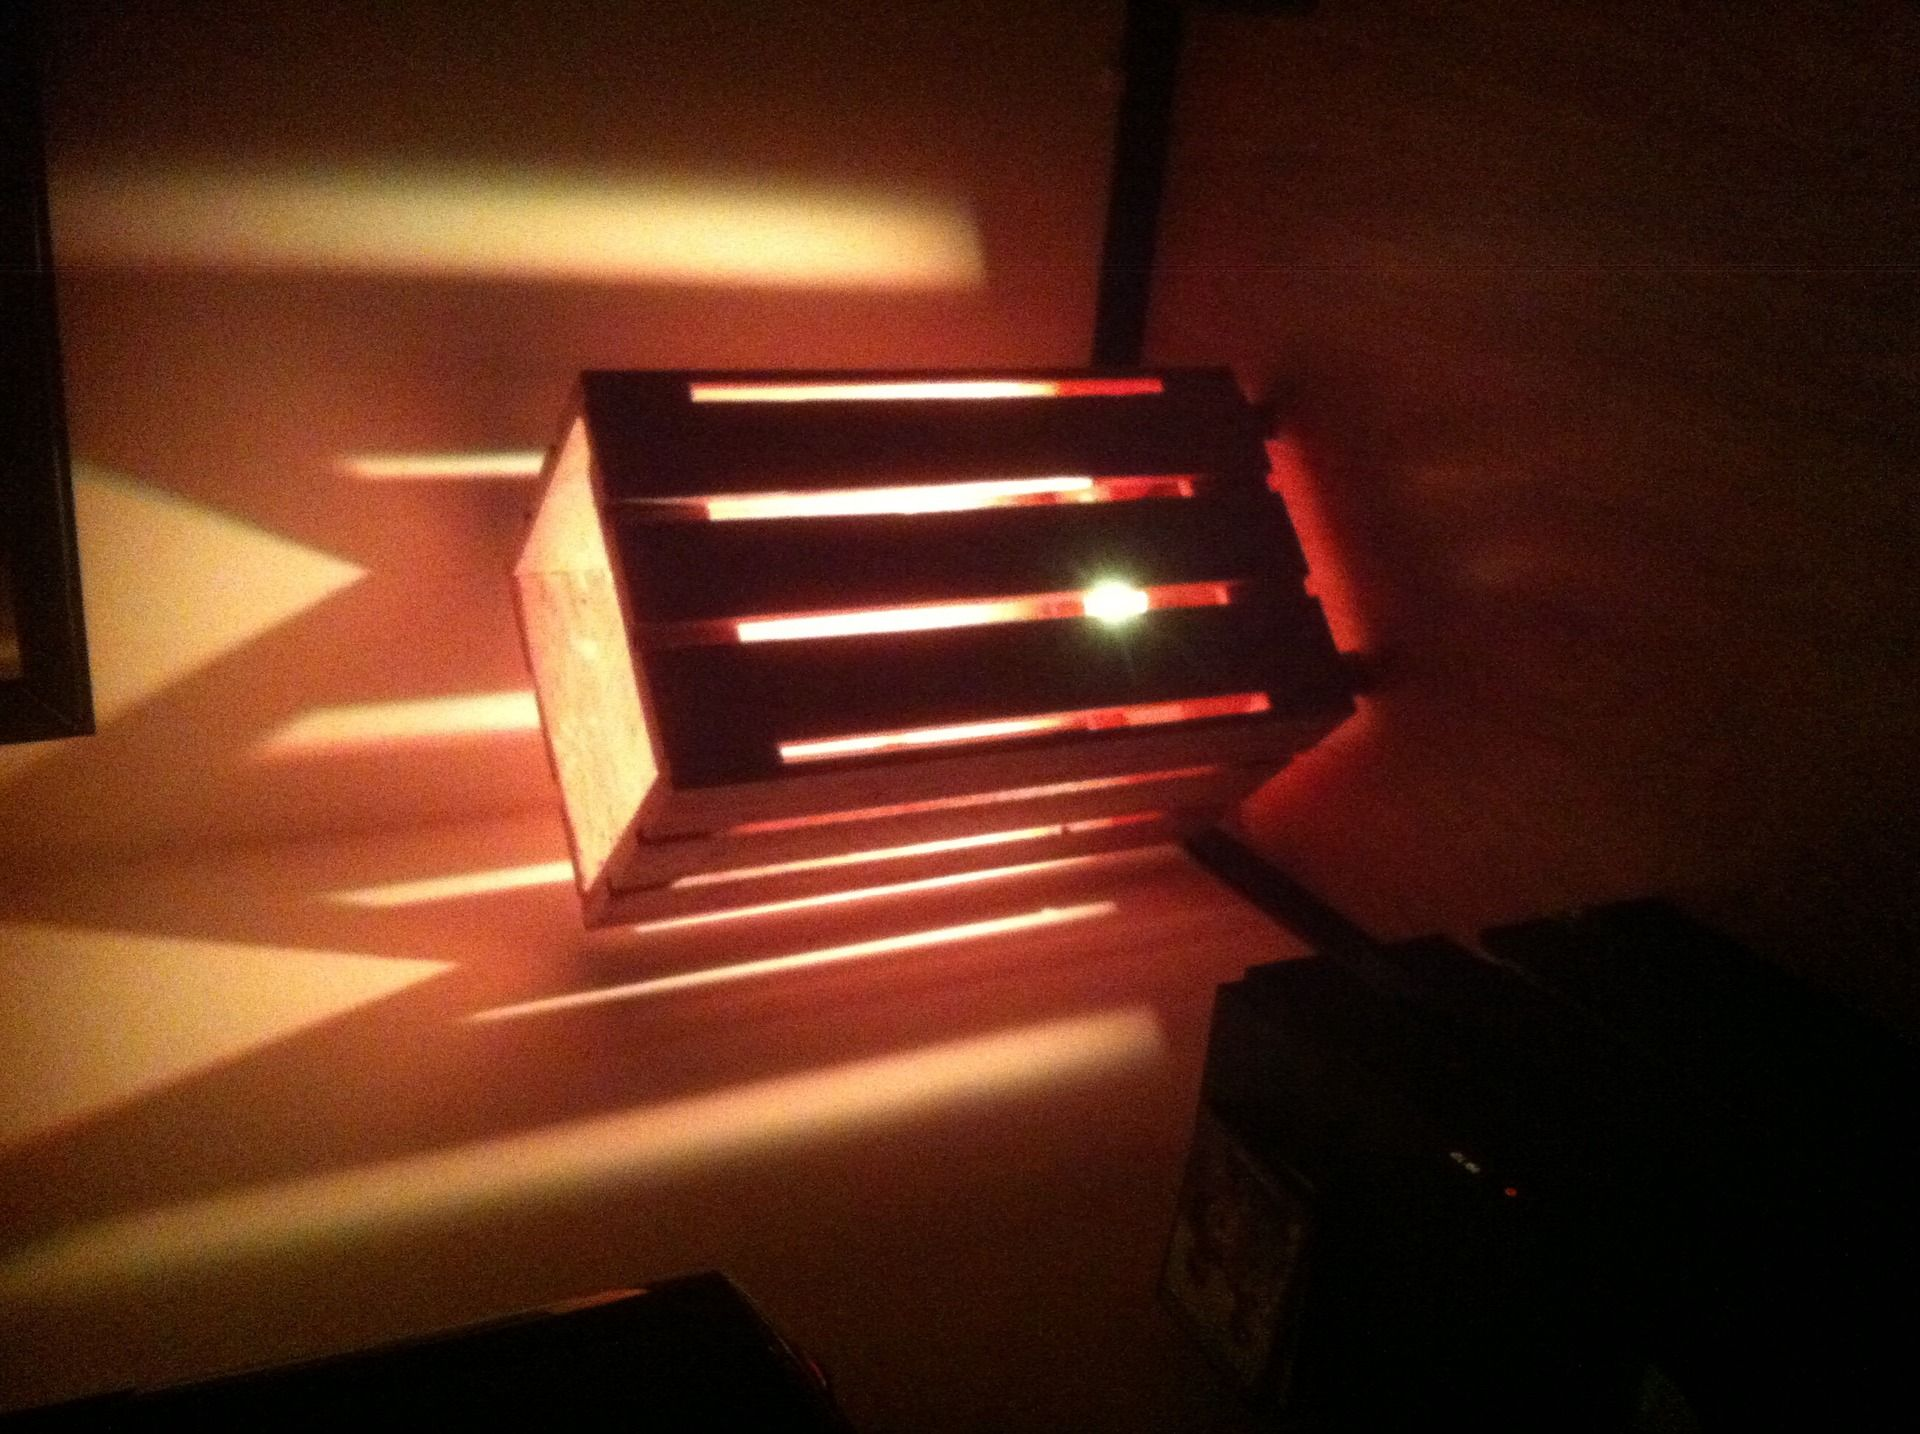 lampe d 39 ambiance design en bois de palette. Black Bedroom Furniture Sets. Home Design Ideas